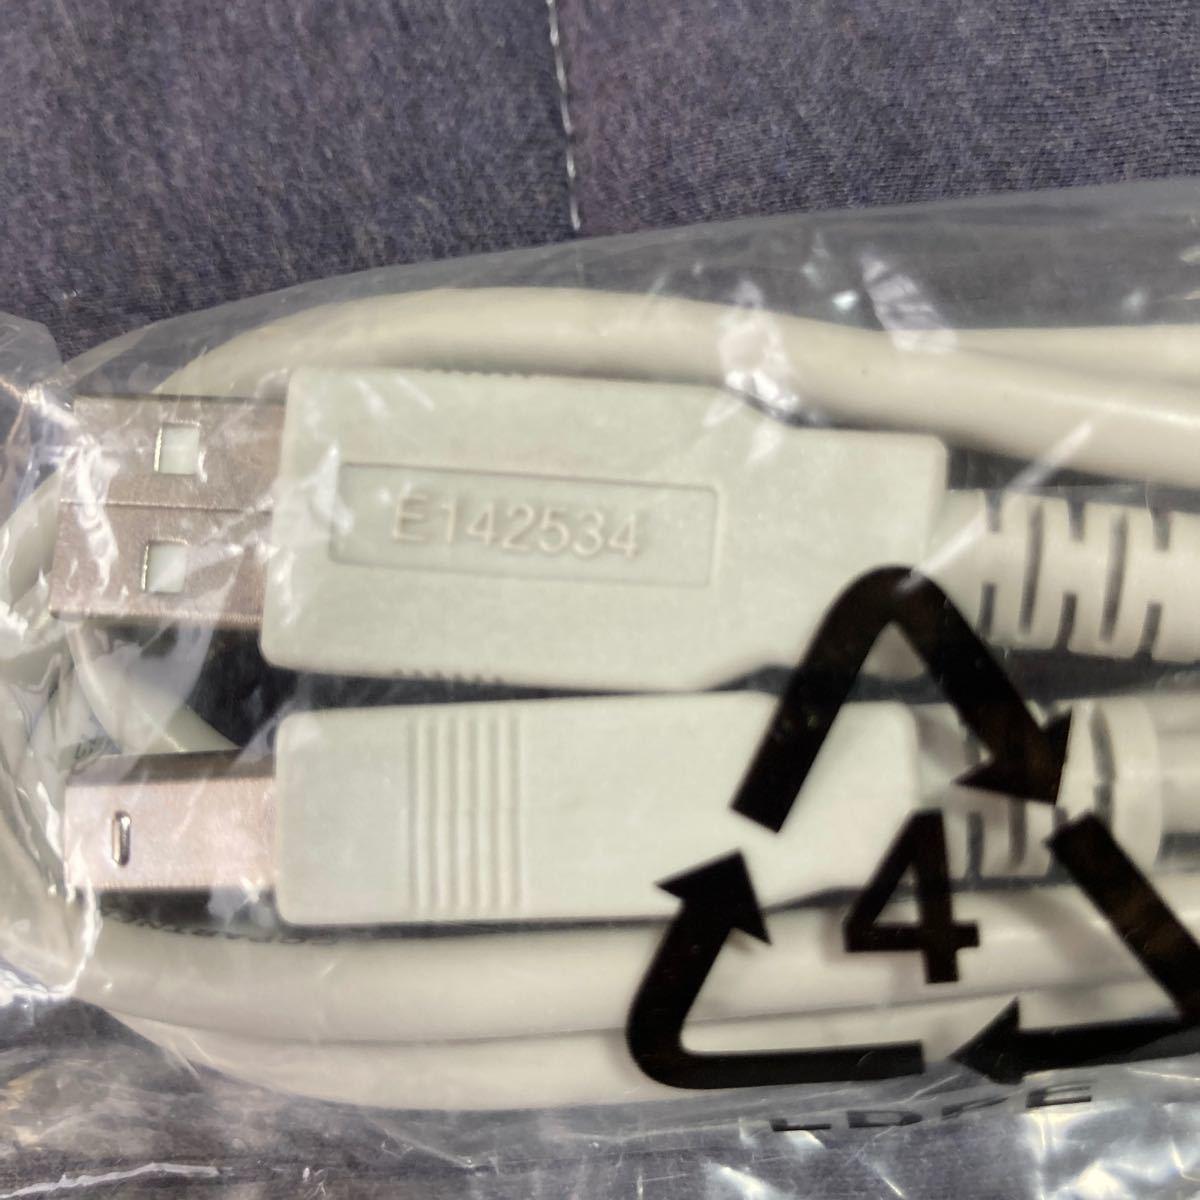 USBケーブル E142534  Part      No.LJ9803001     ブラザープリンター用